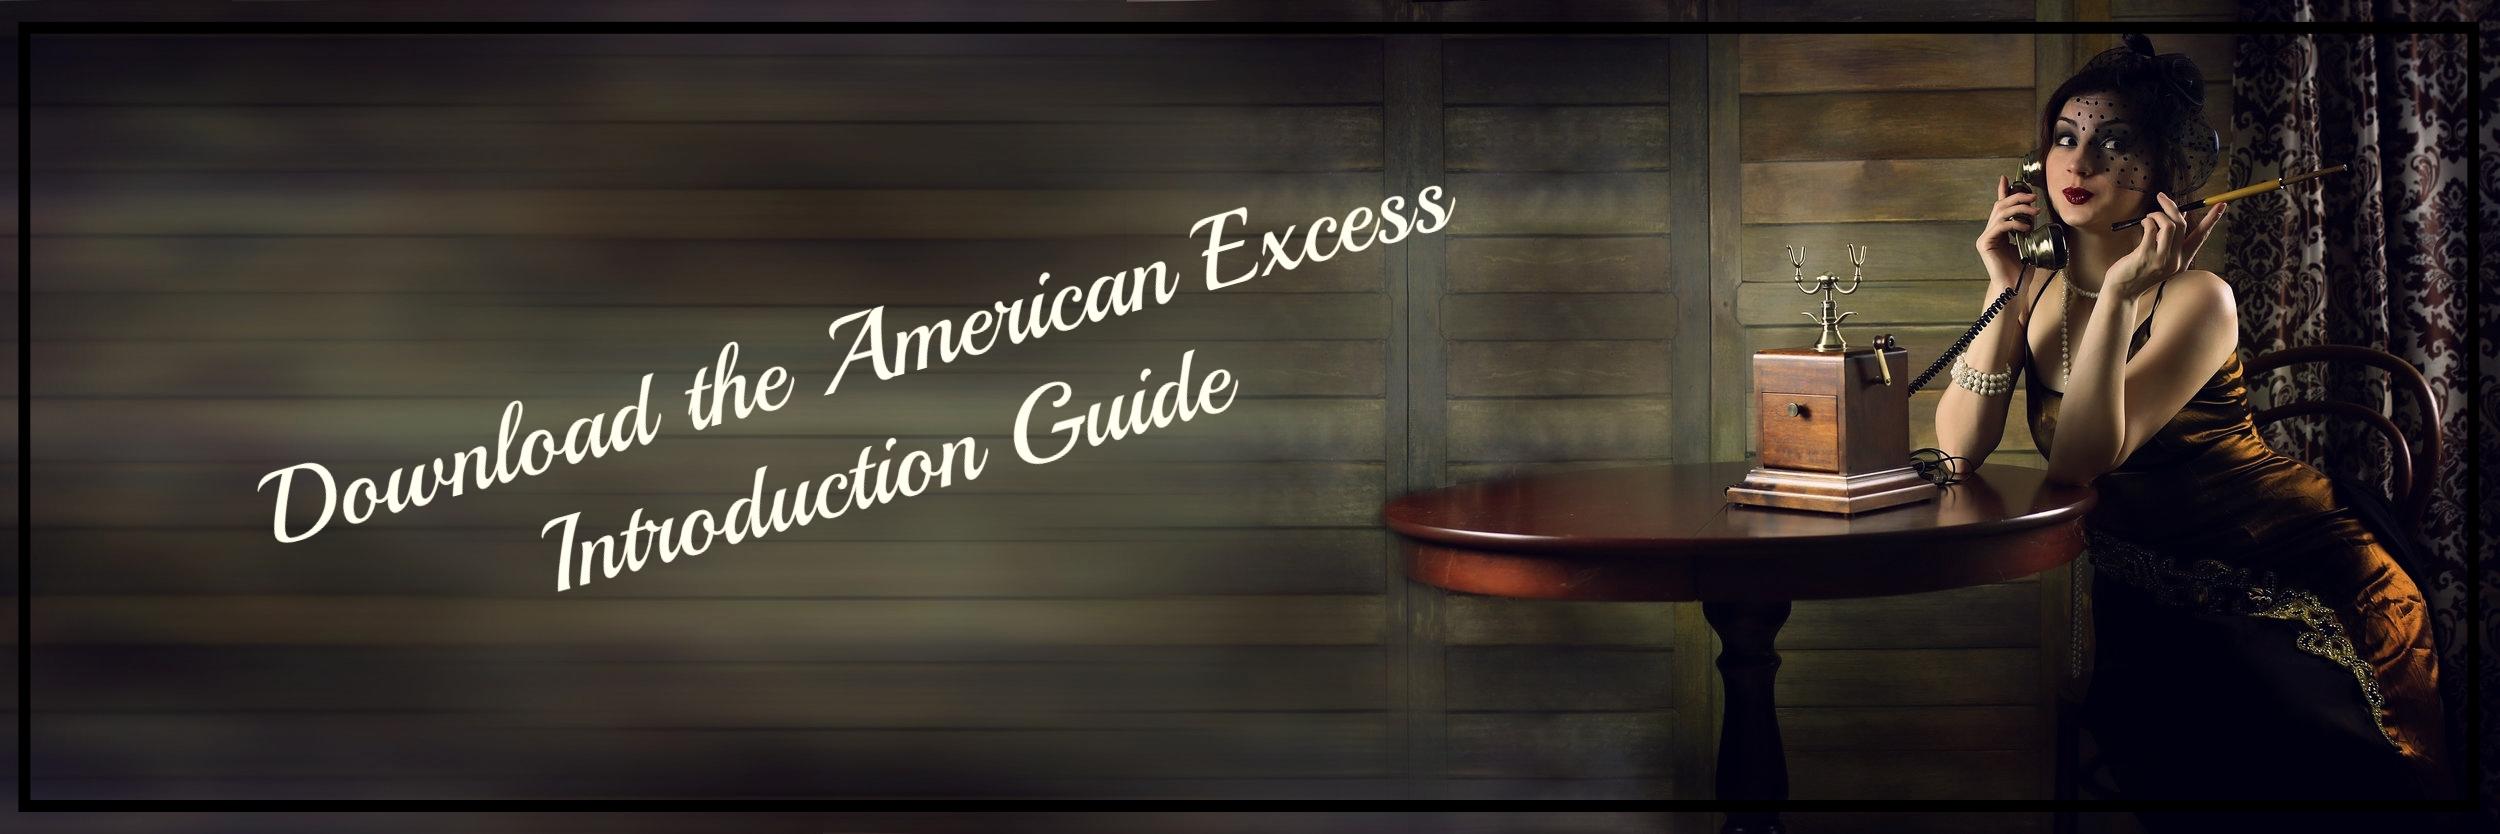 American Excess 1.jpeg